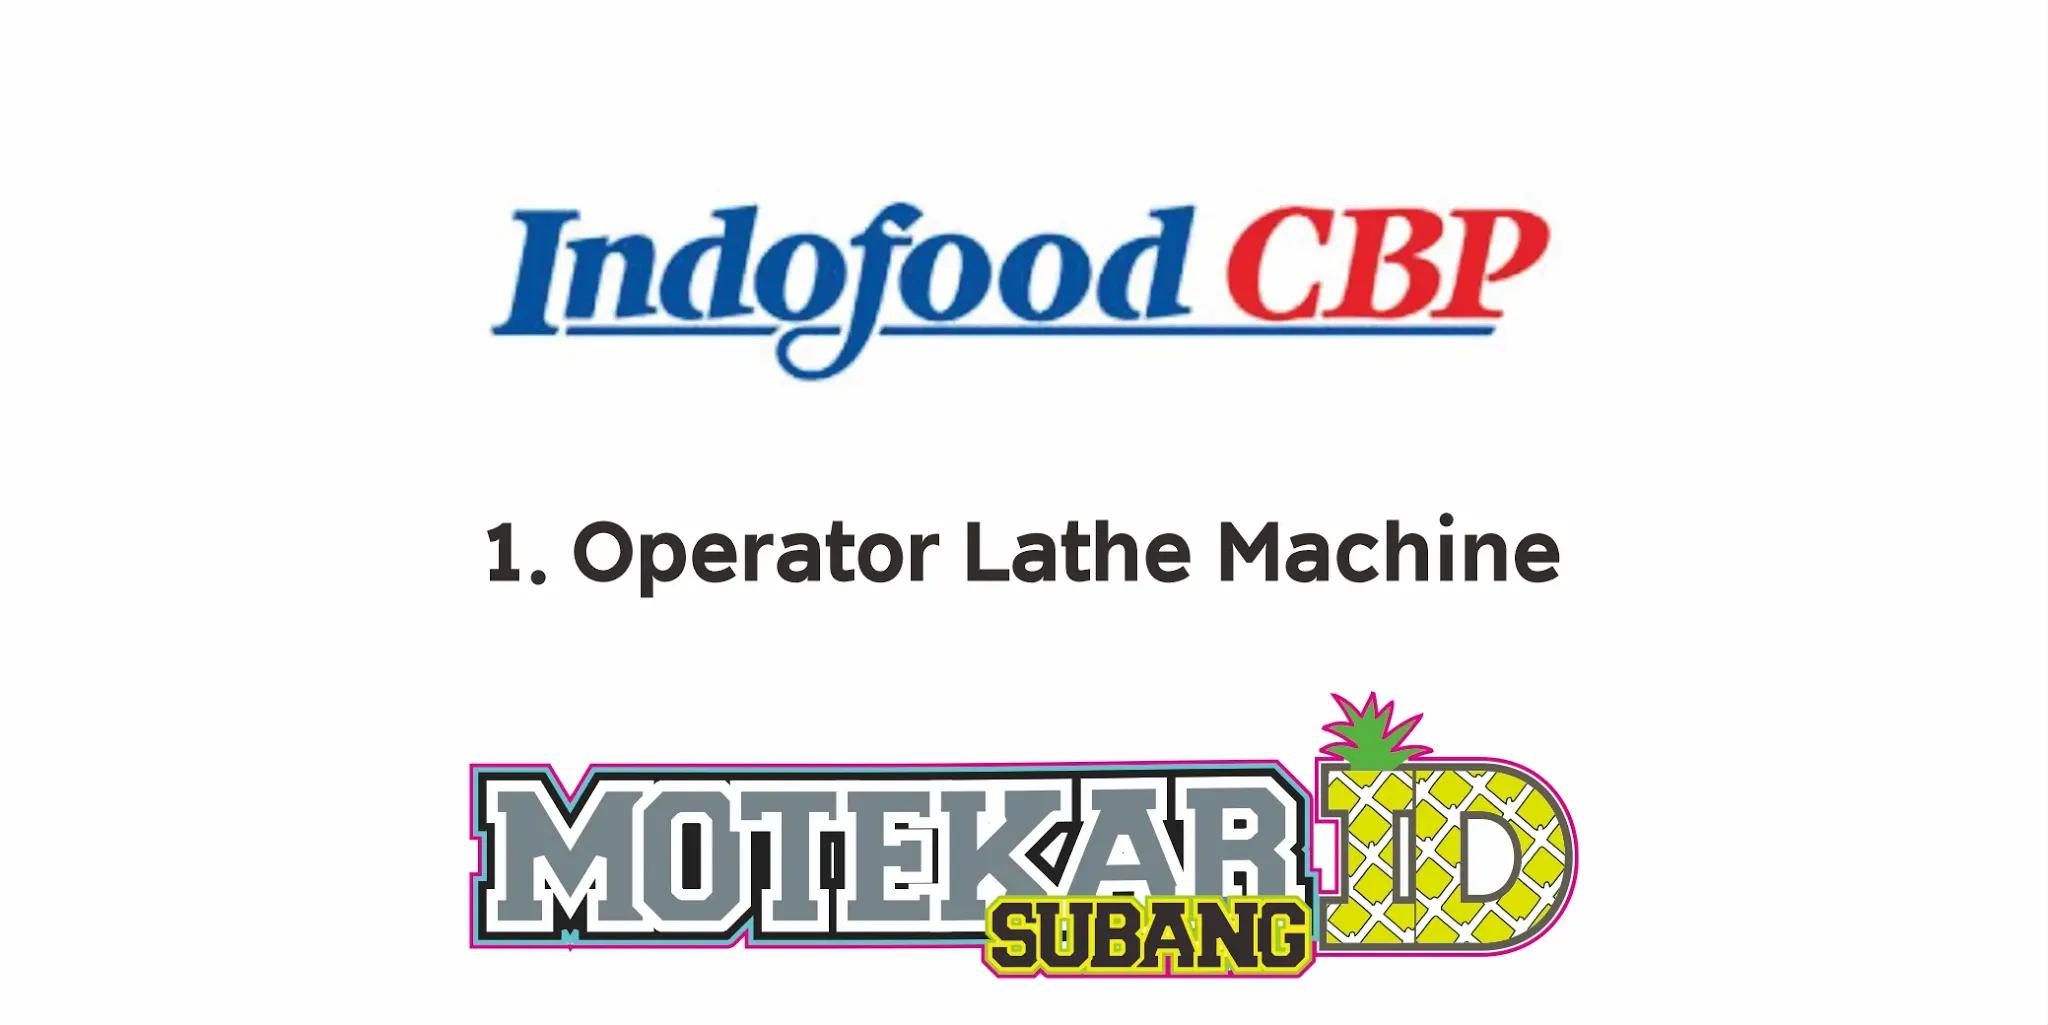 Download Lowongan Kerja Pt Indofood 2021 Pics